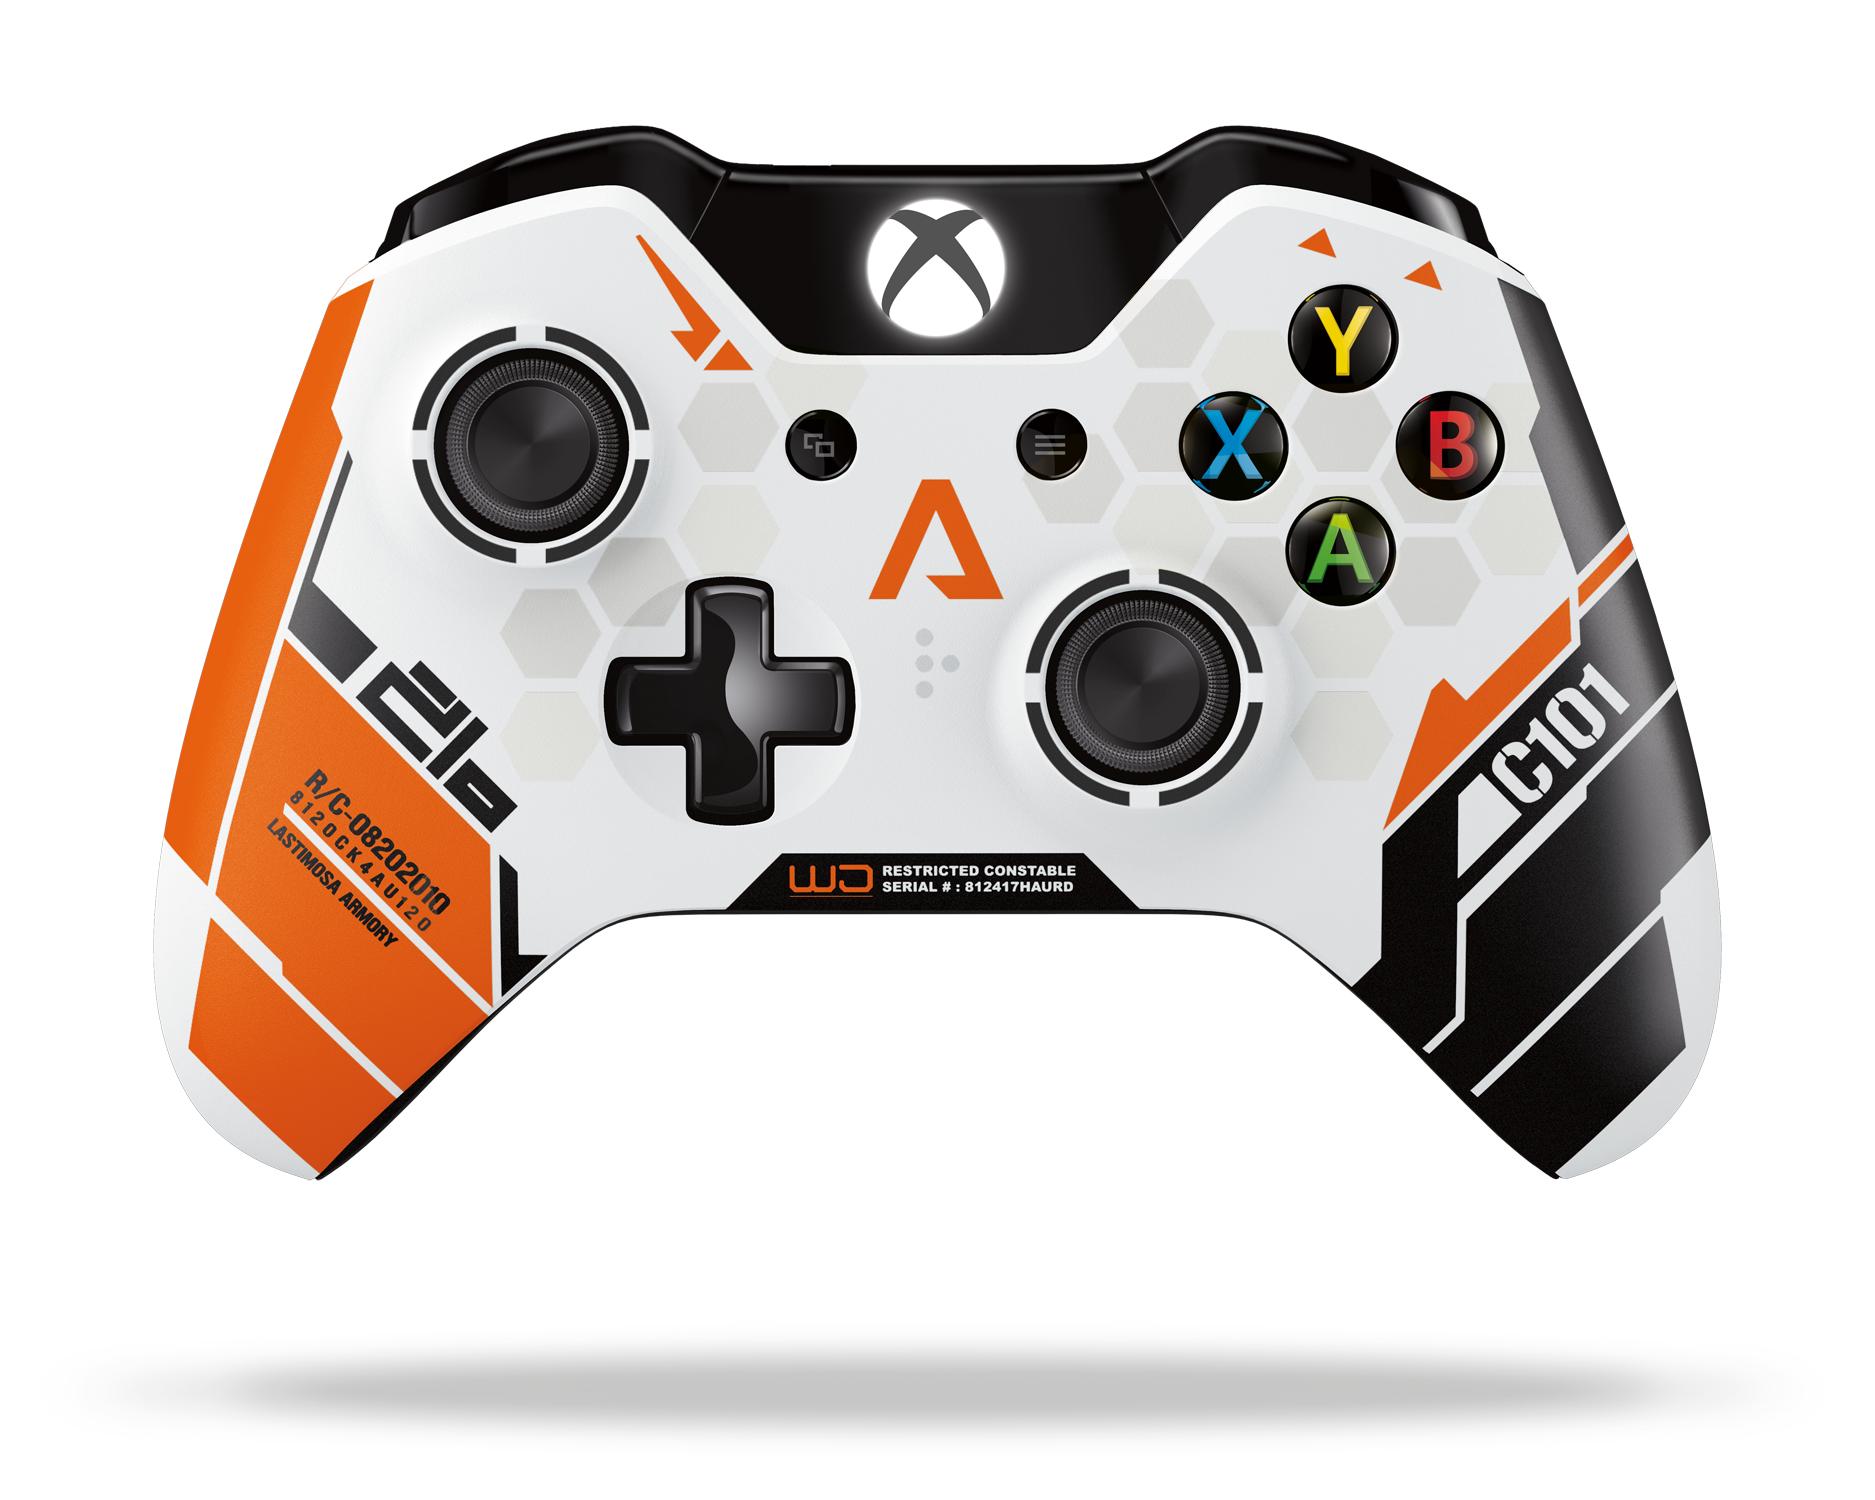 Titanfall Ea Respawn Enterainment Xbox One Funk Gumbo Radio Http Www Live365 Com Stations Sirhobson And Titanfall Xbox One Controller Xbox One Games